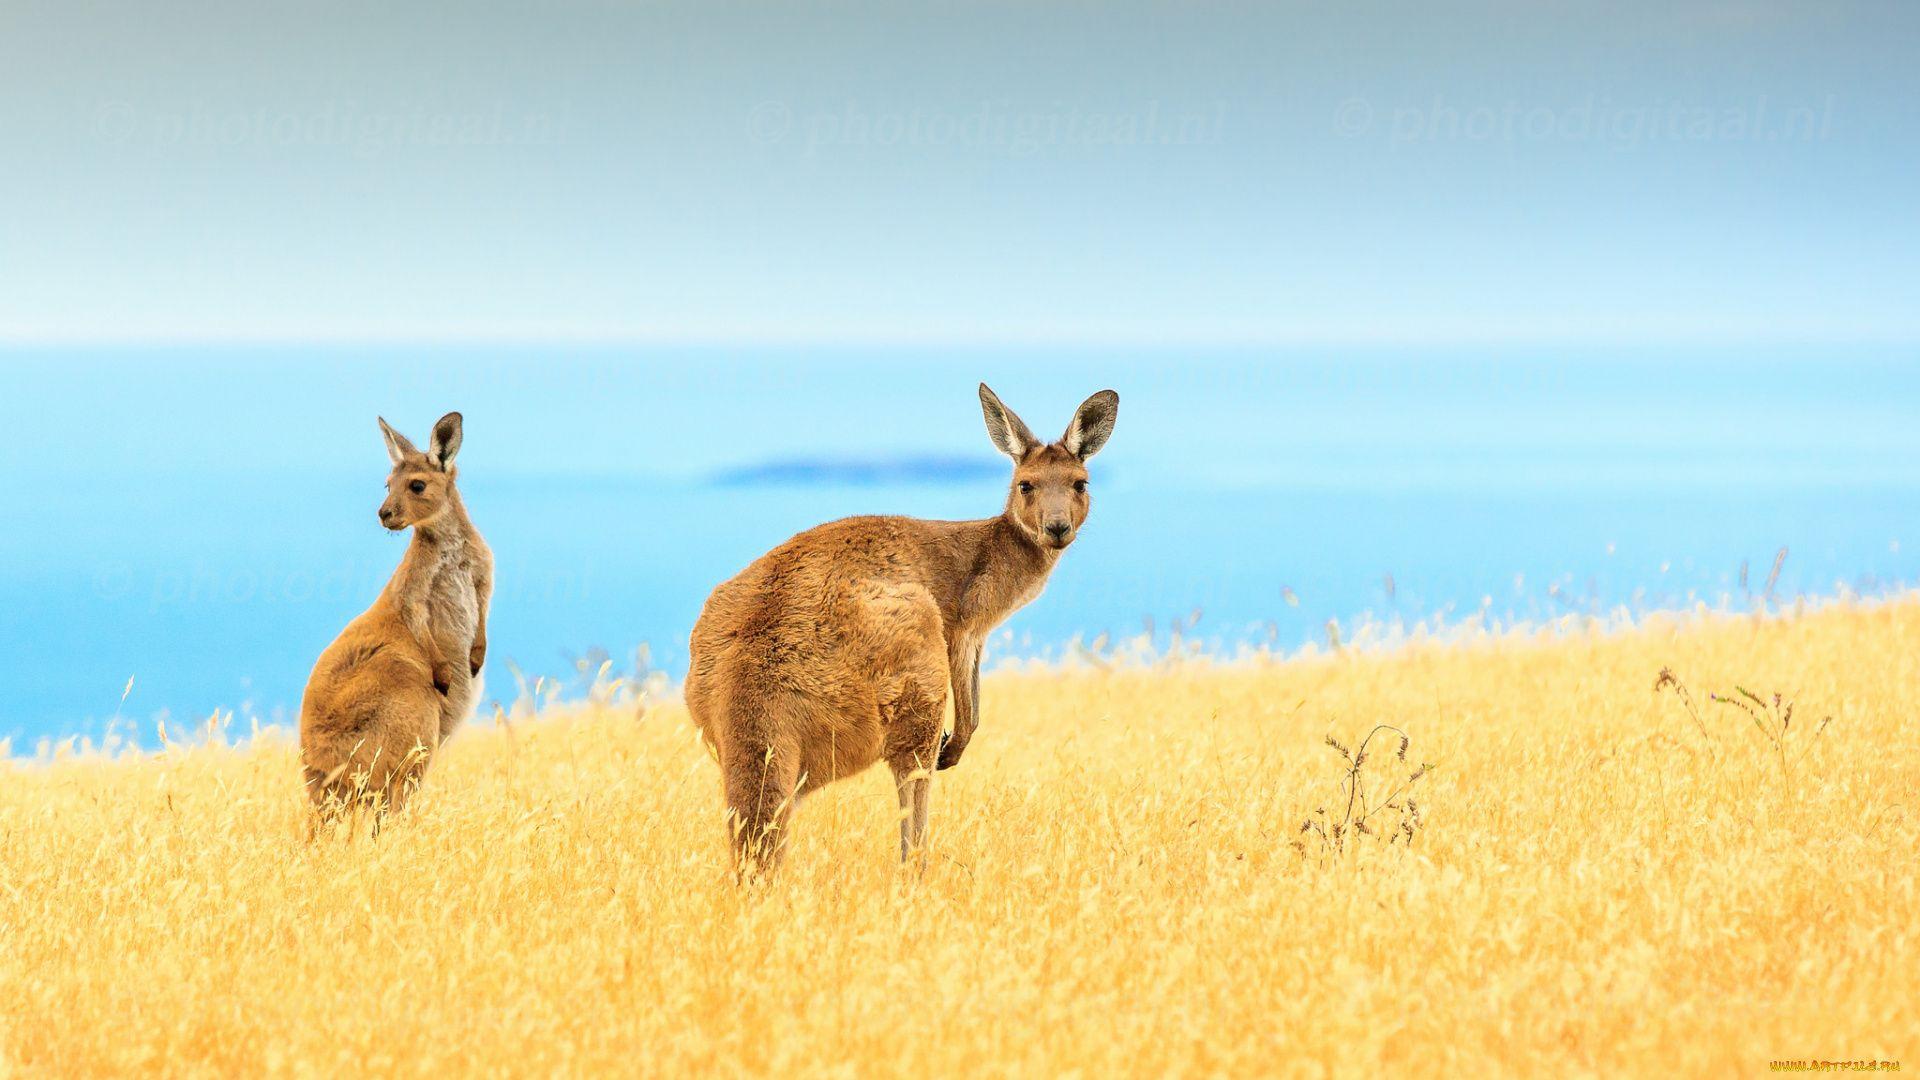 Kangaroo Beautiful Photo